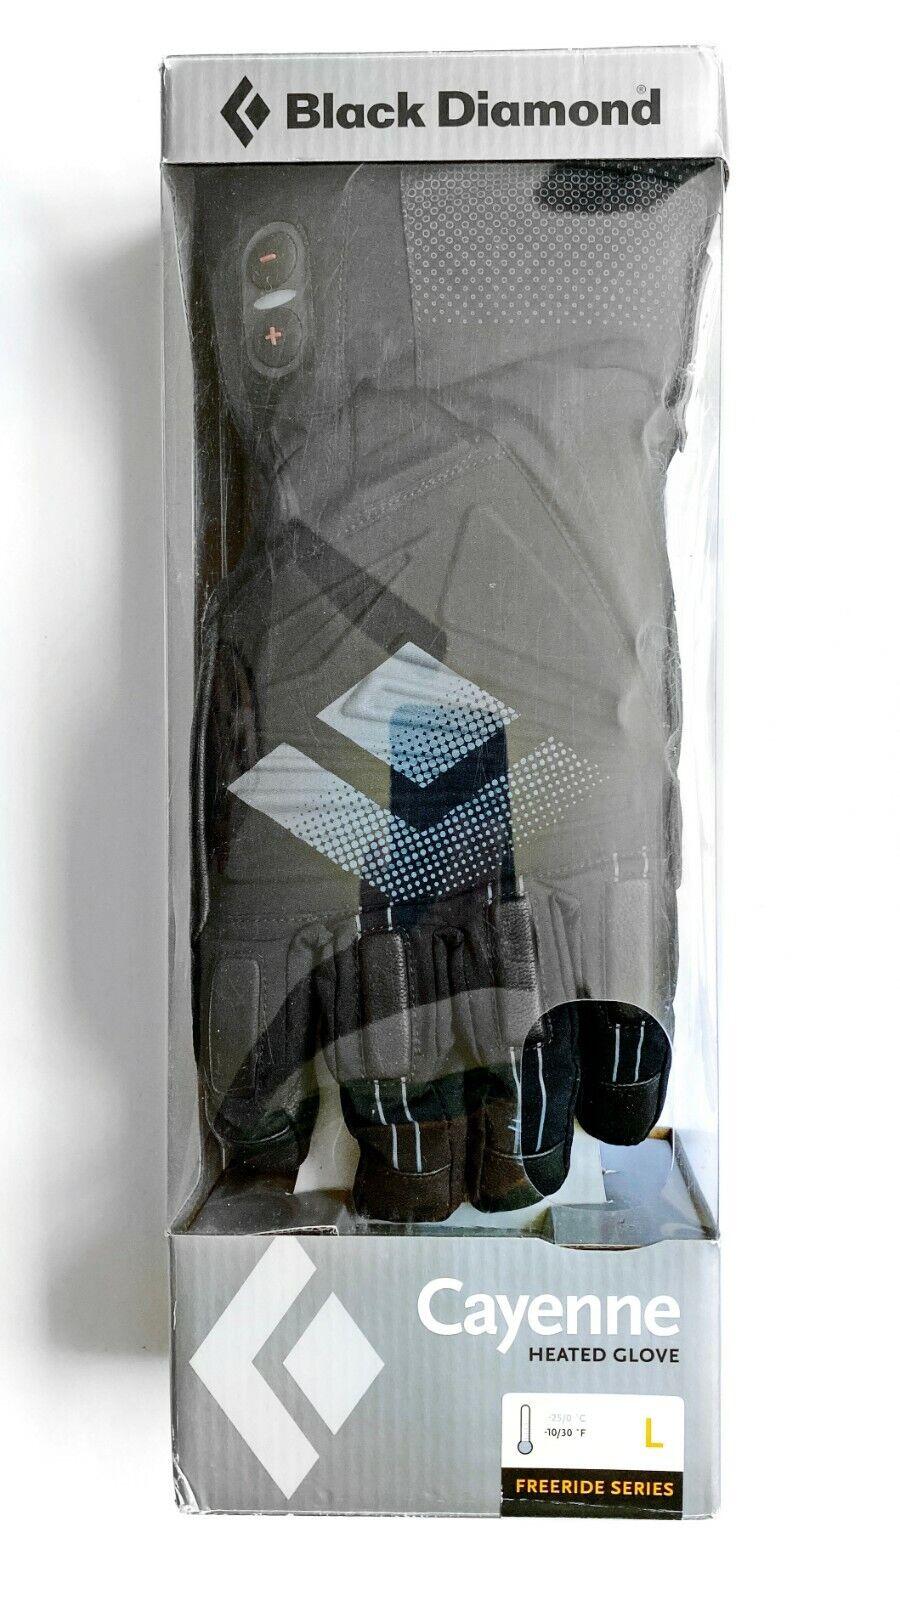 Black Diamond Cayenne Goretex HEATED Gloves Large - 3 Levels - Brand NEW in box